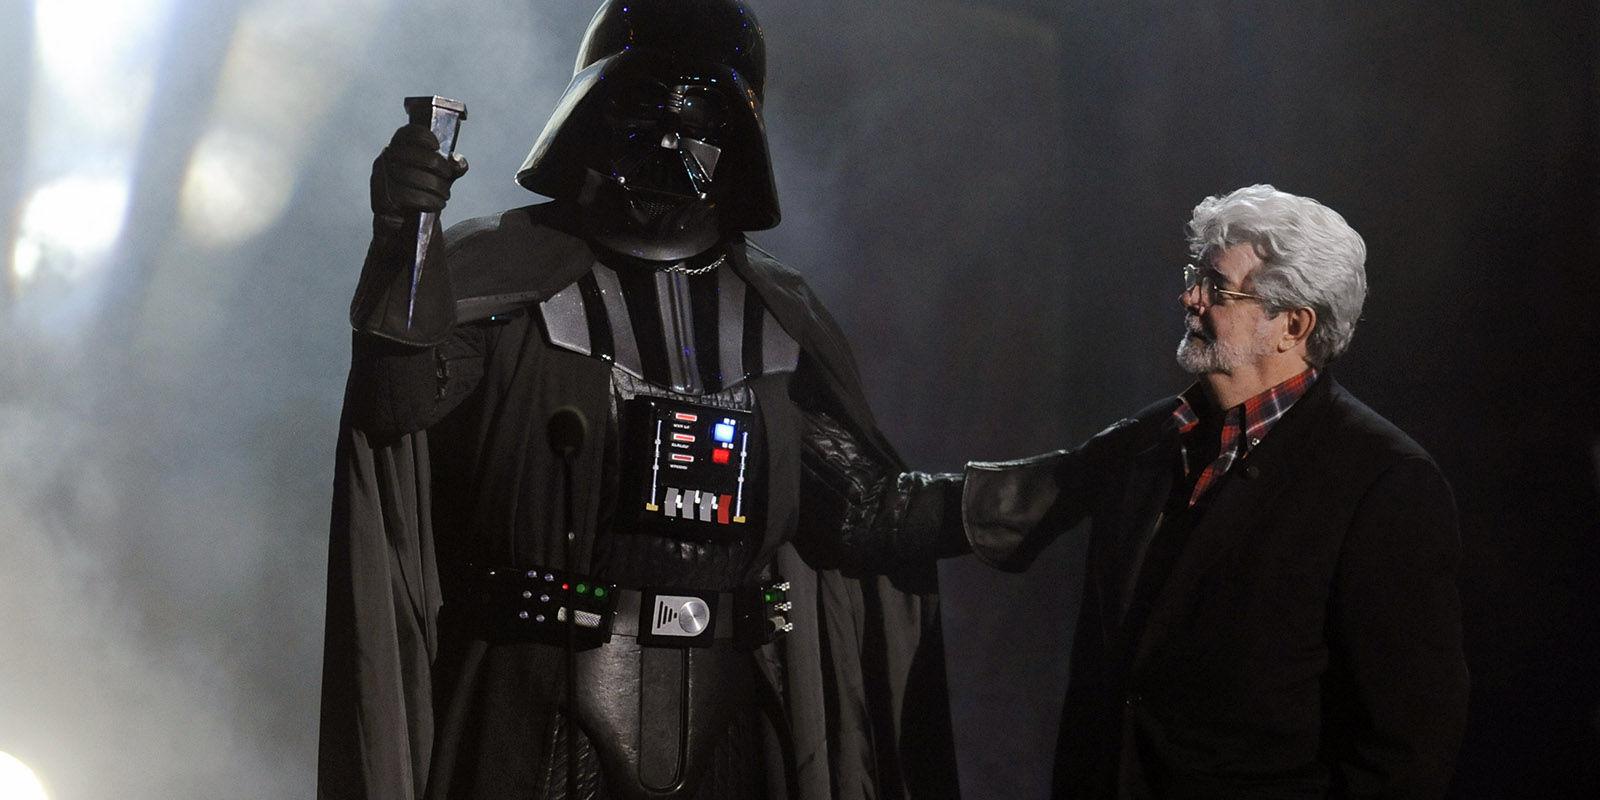 George-Lucas-Darth-Vader-Star-Wars